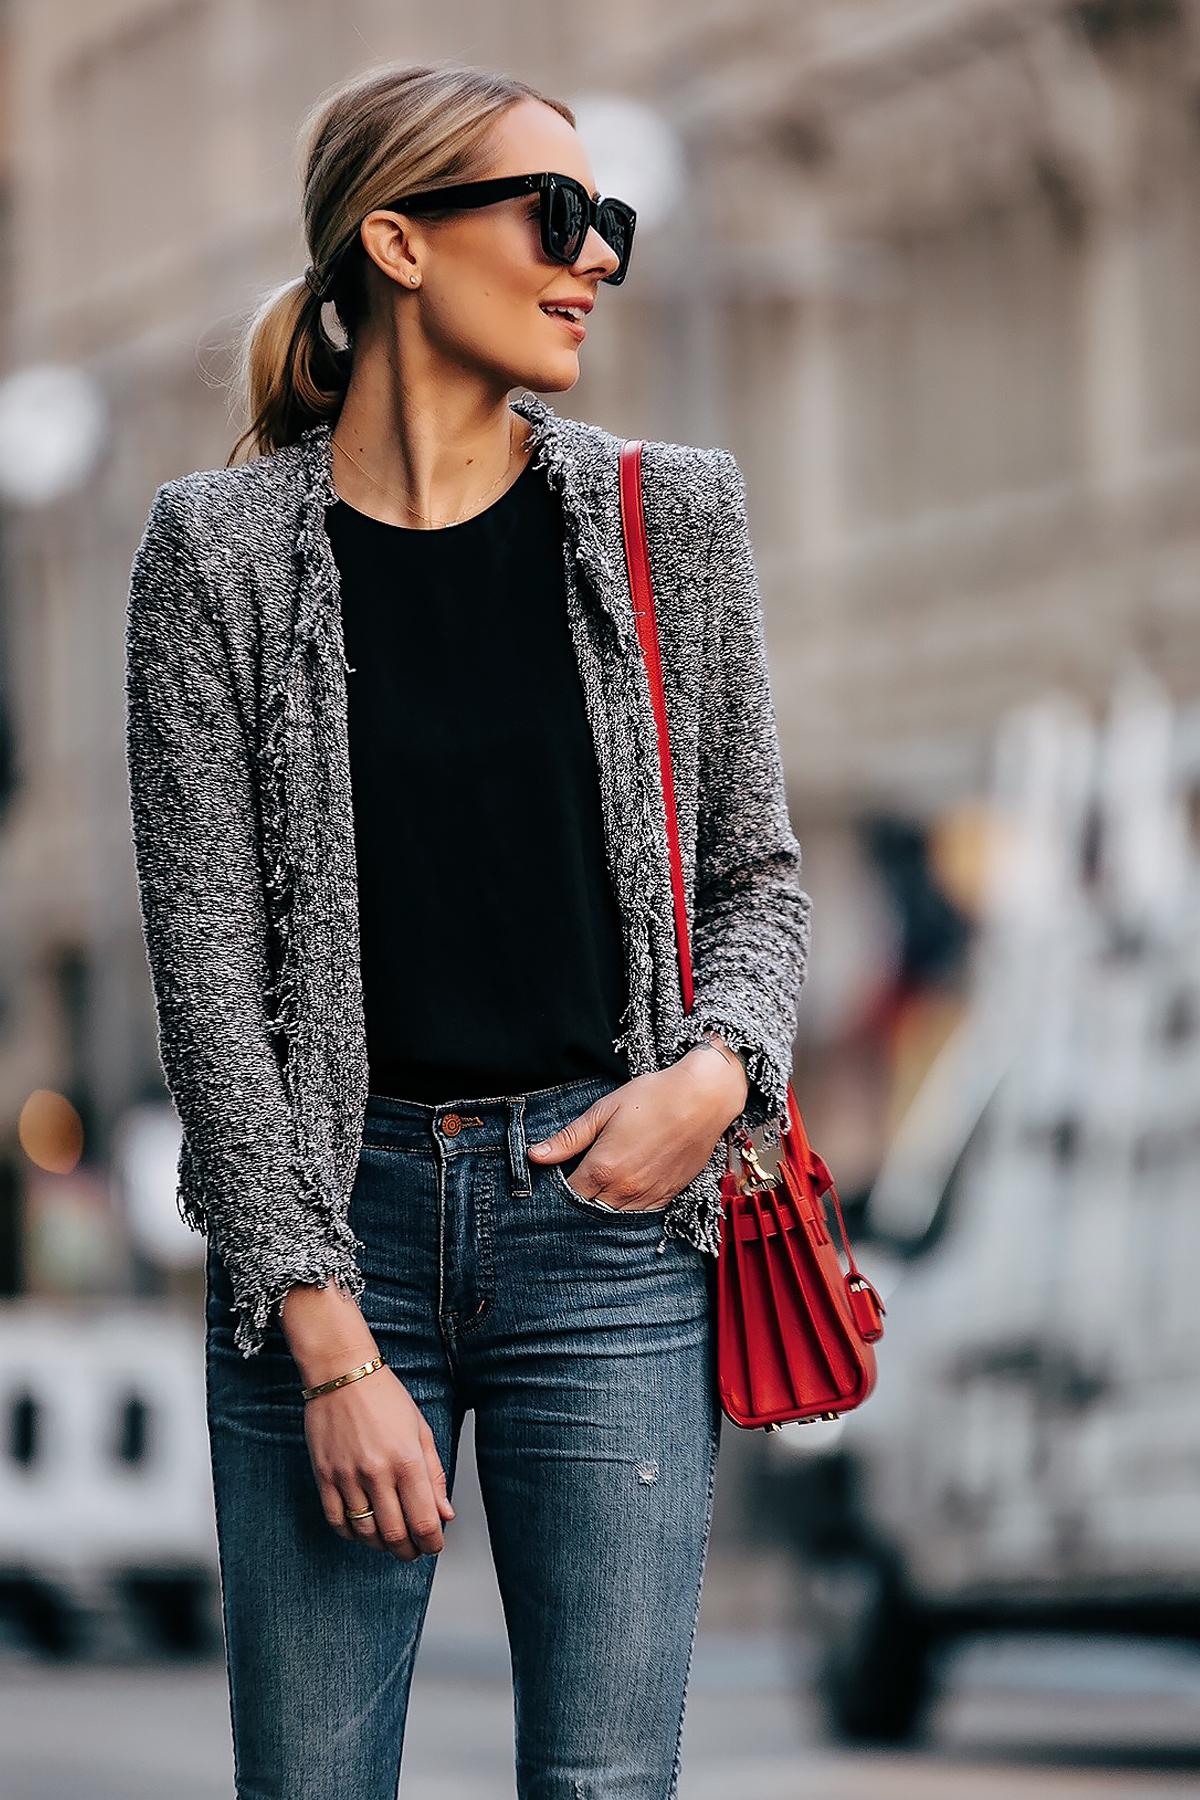 Blonde Woman Wearing IRO Grey Tweed Jacket Black Top Denim Jeans Red YSL Sac De Jour Nano Fashion Jackson San Diego Fashion Blogger Street Style